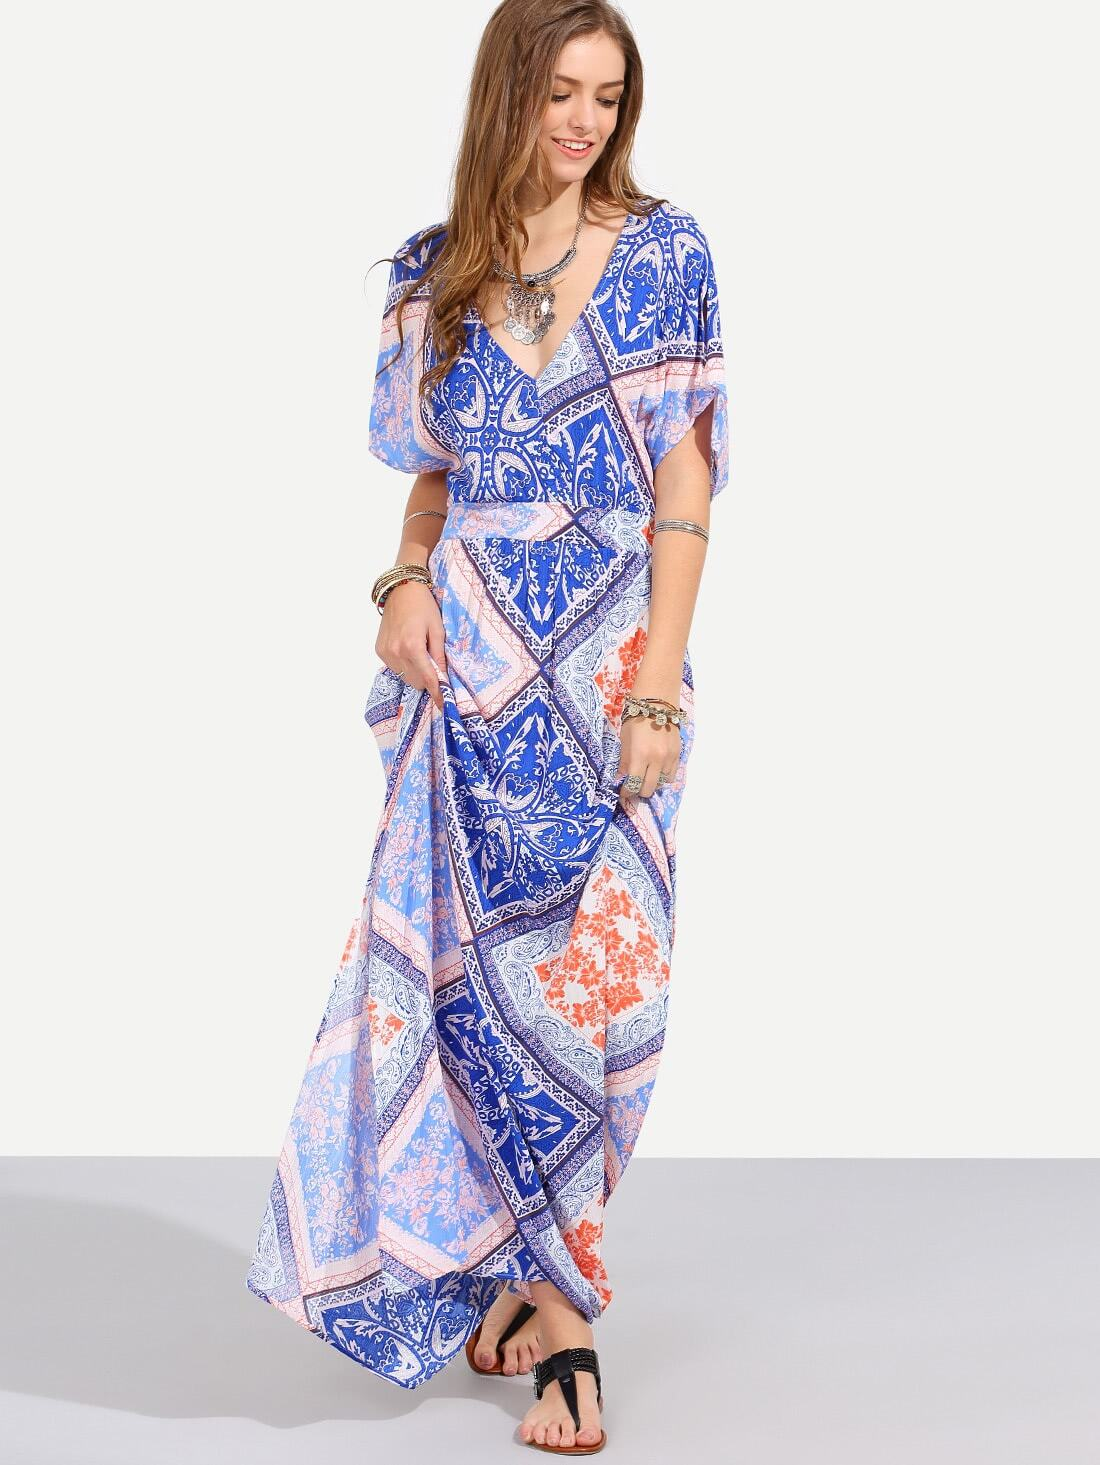 Multicolor Print V Neck Split Side Maxi Dress dress160526720